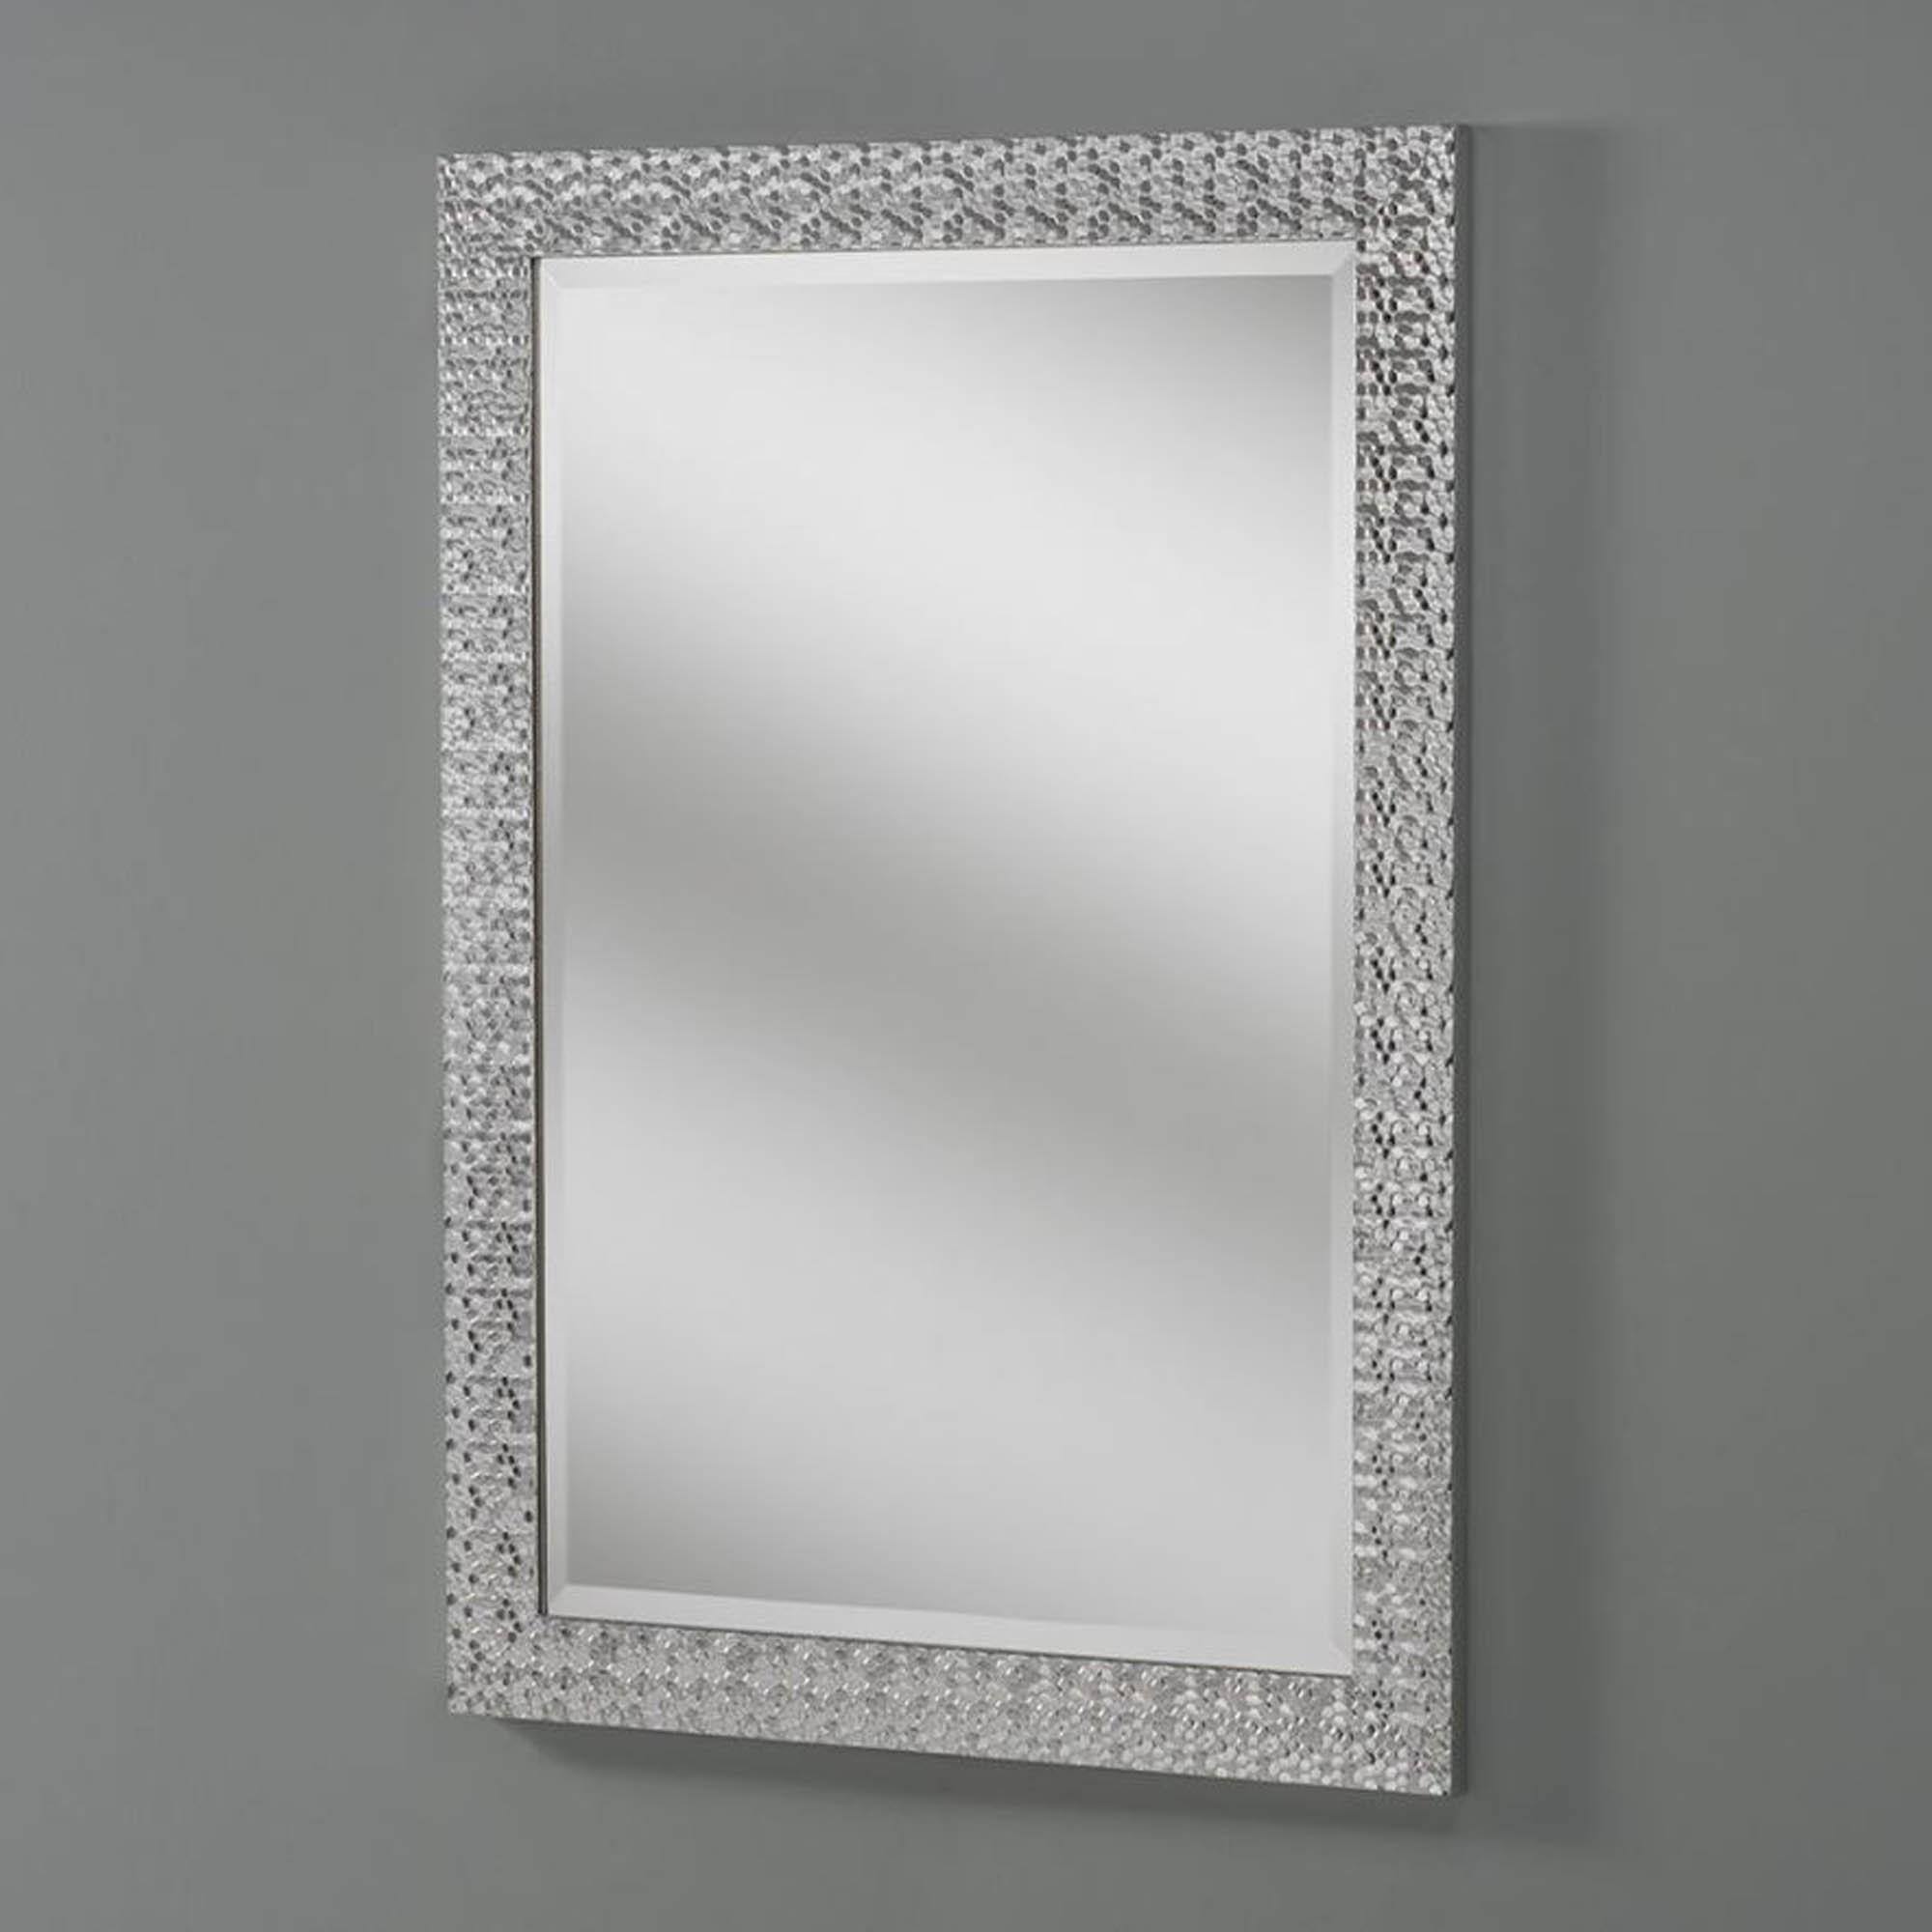 Silver Wall Mirrors Decorative.Decorative Hex Silver Wall Mirror